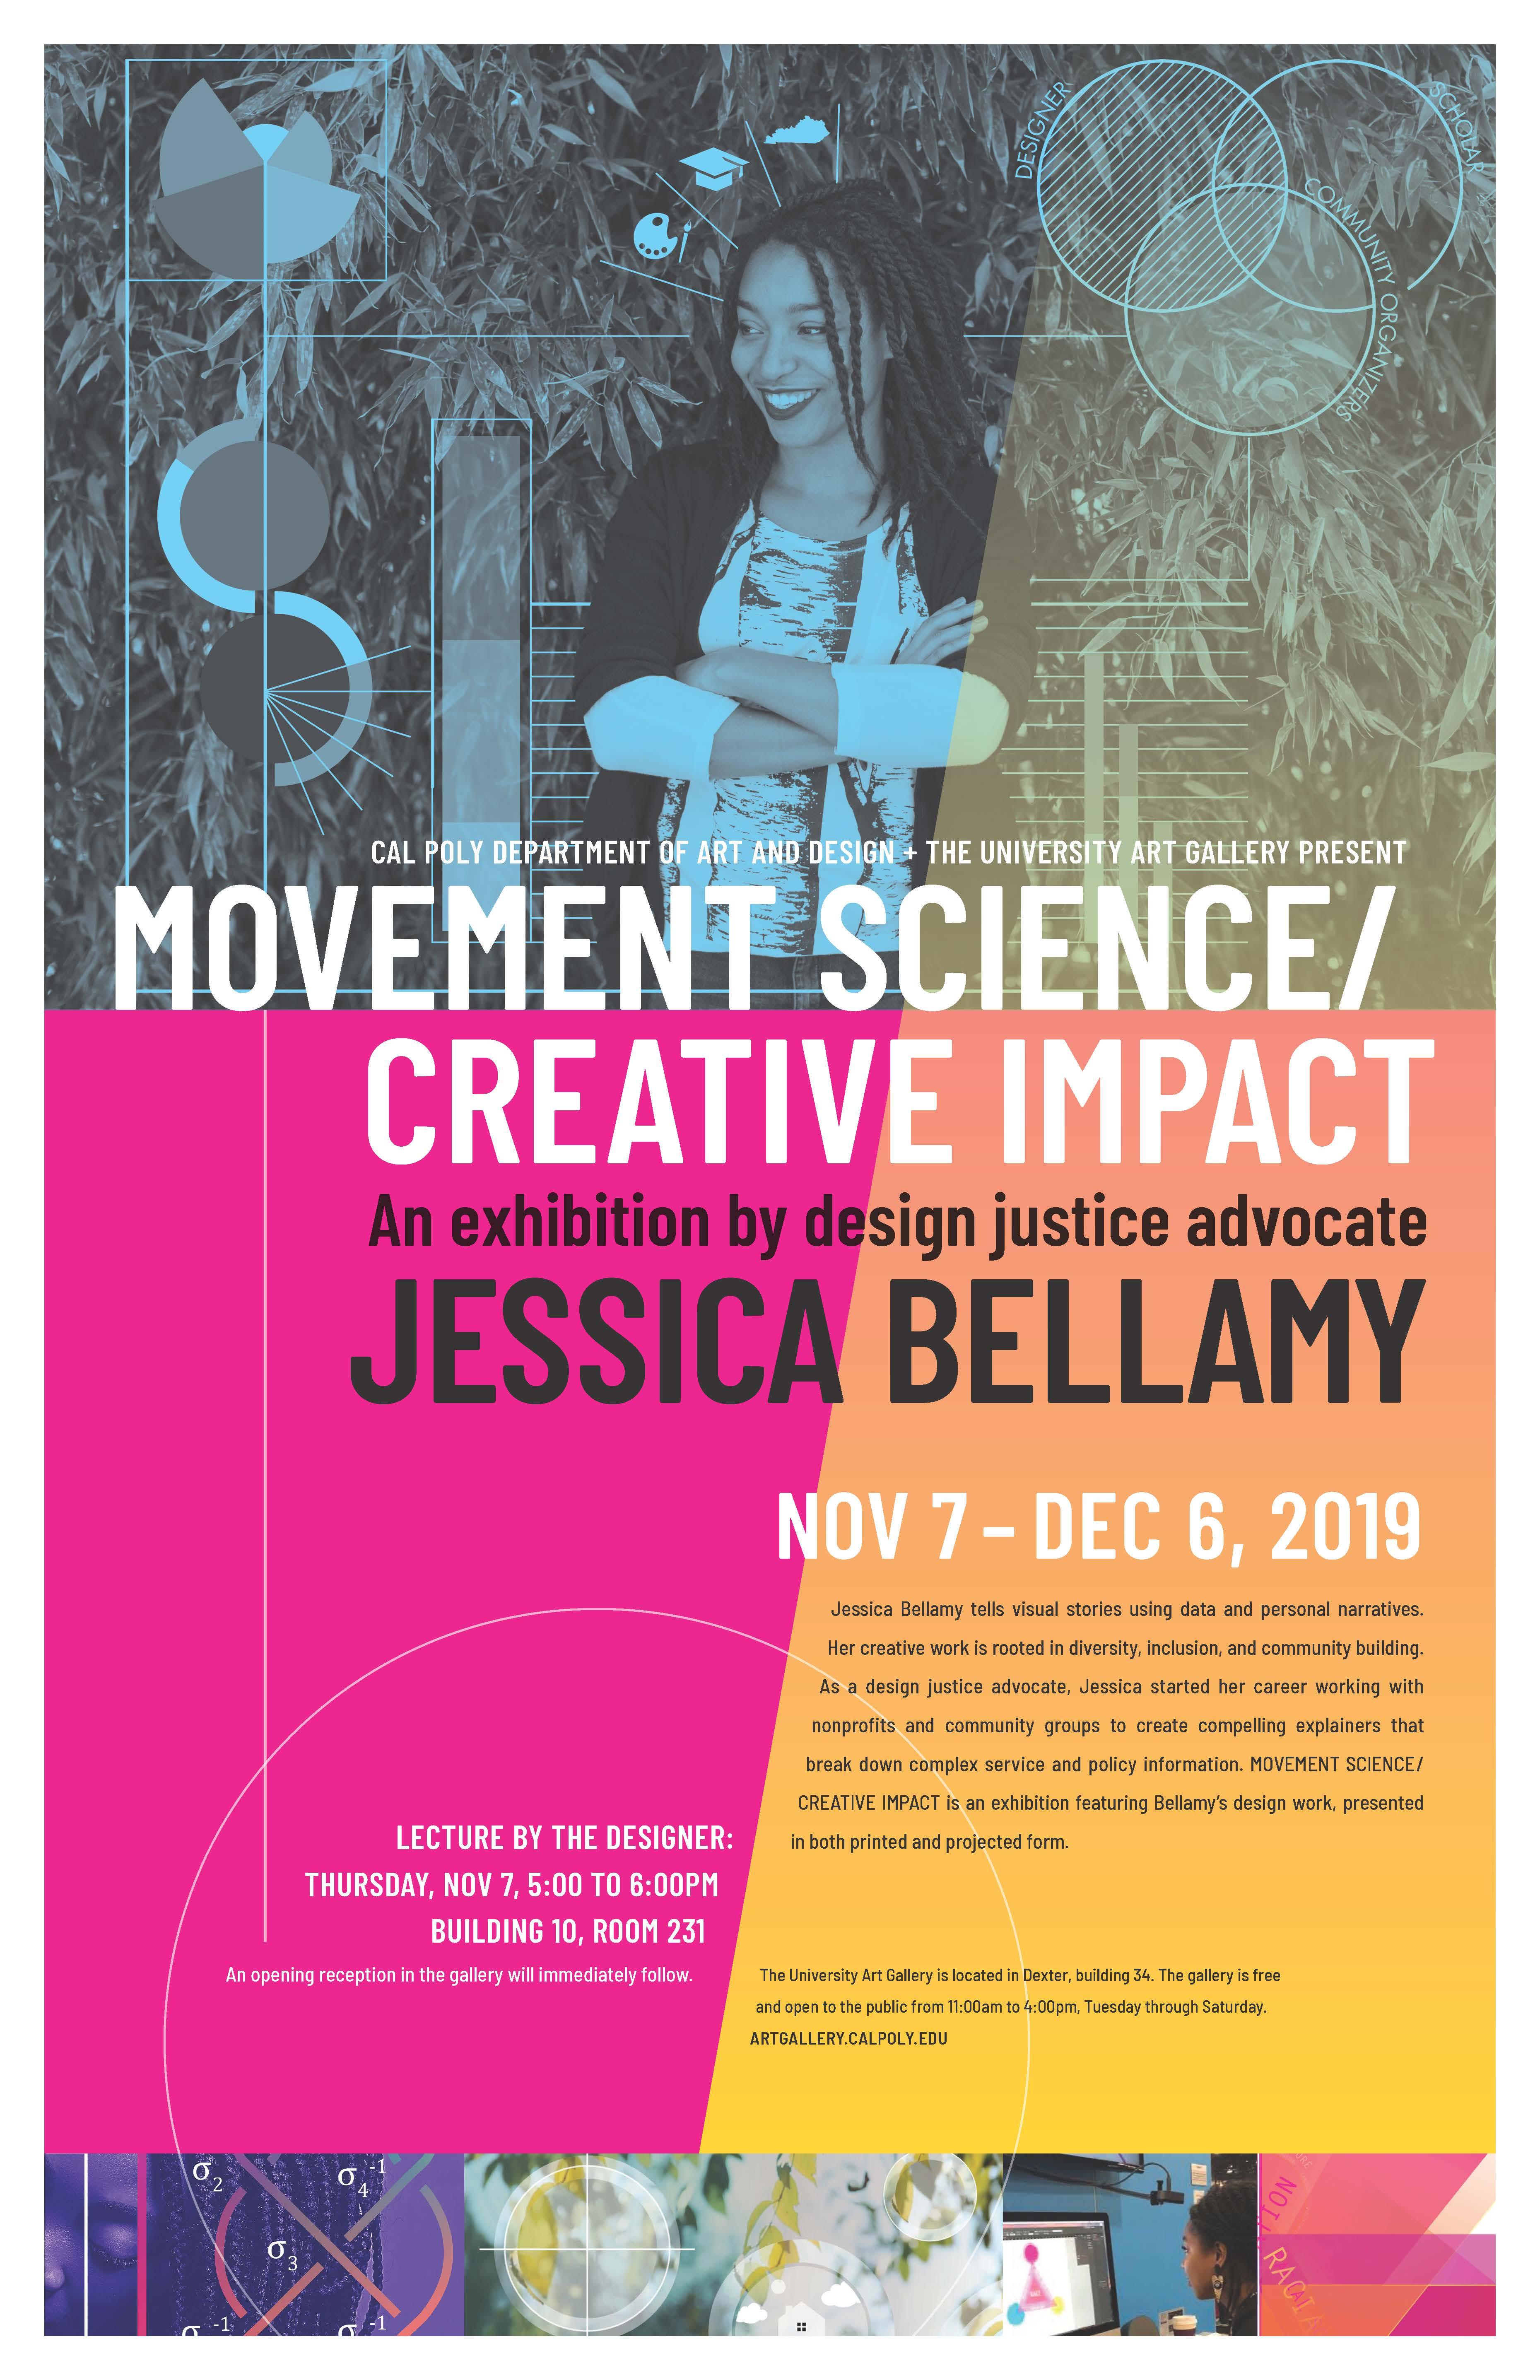 Artist Jessica Bellamy